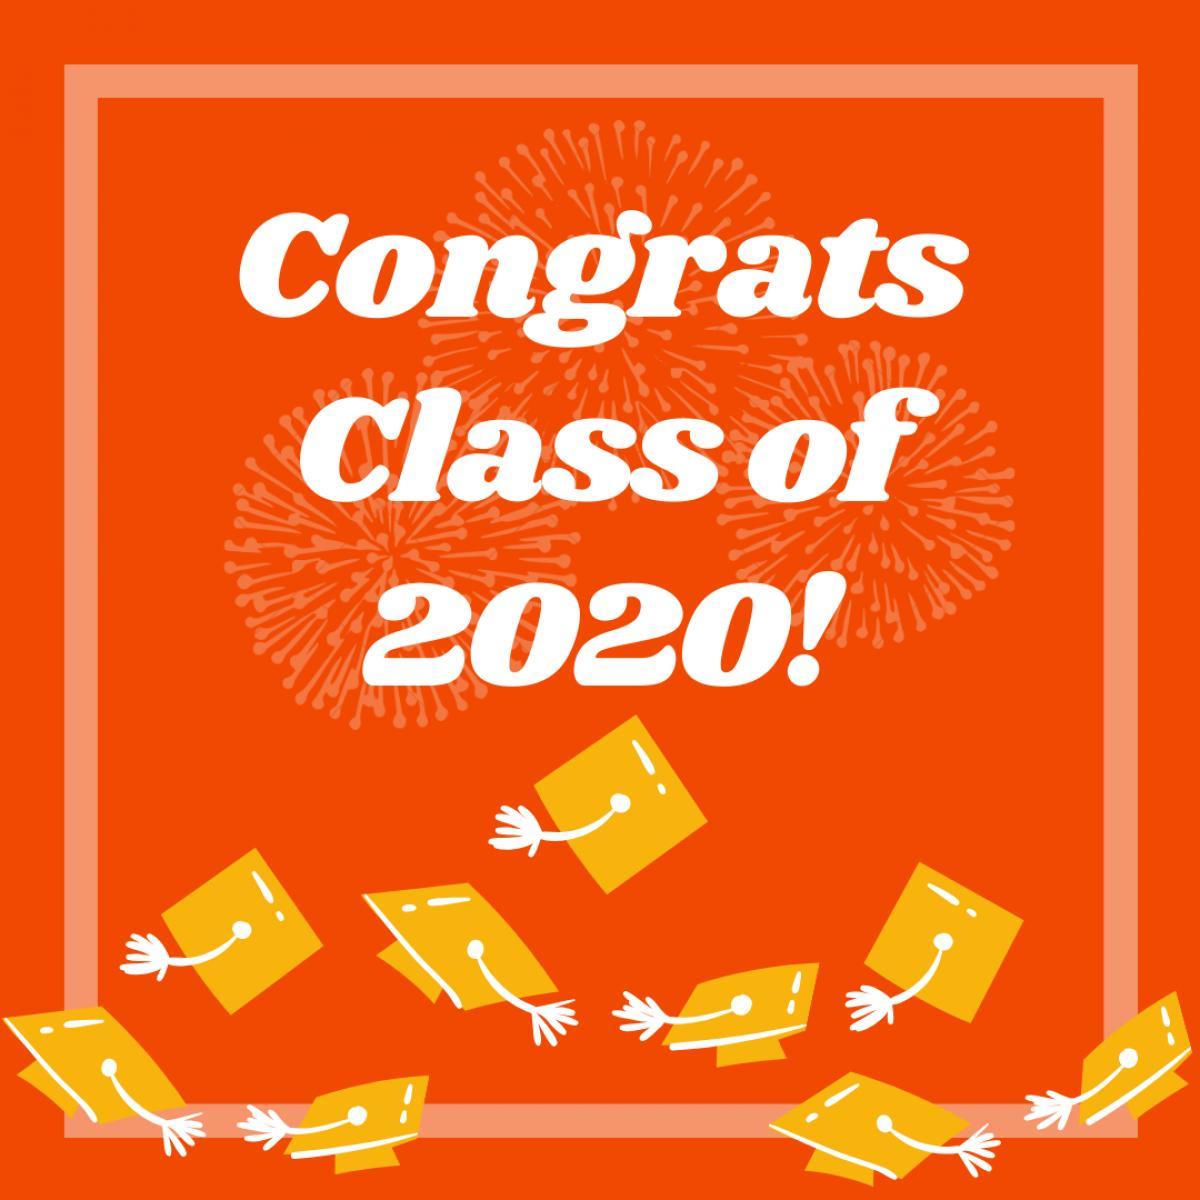 Congrats Class of 2020!